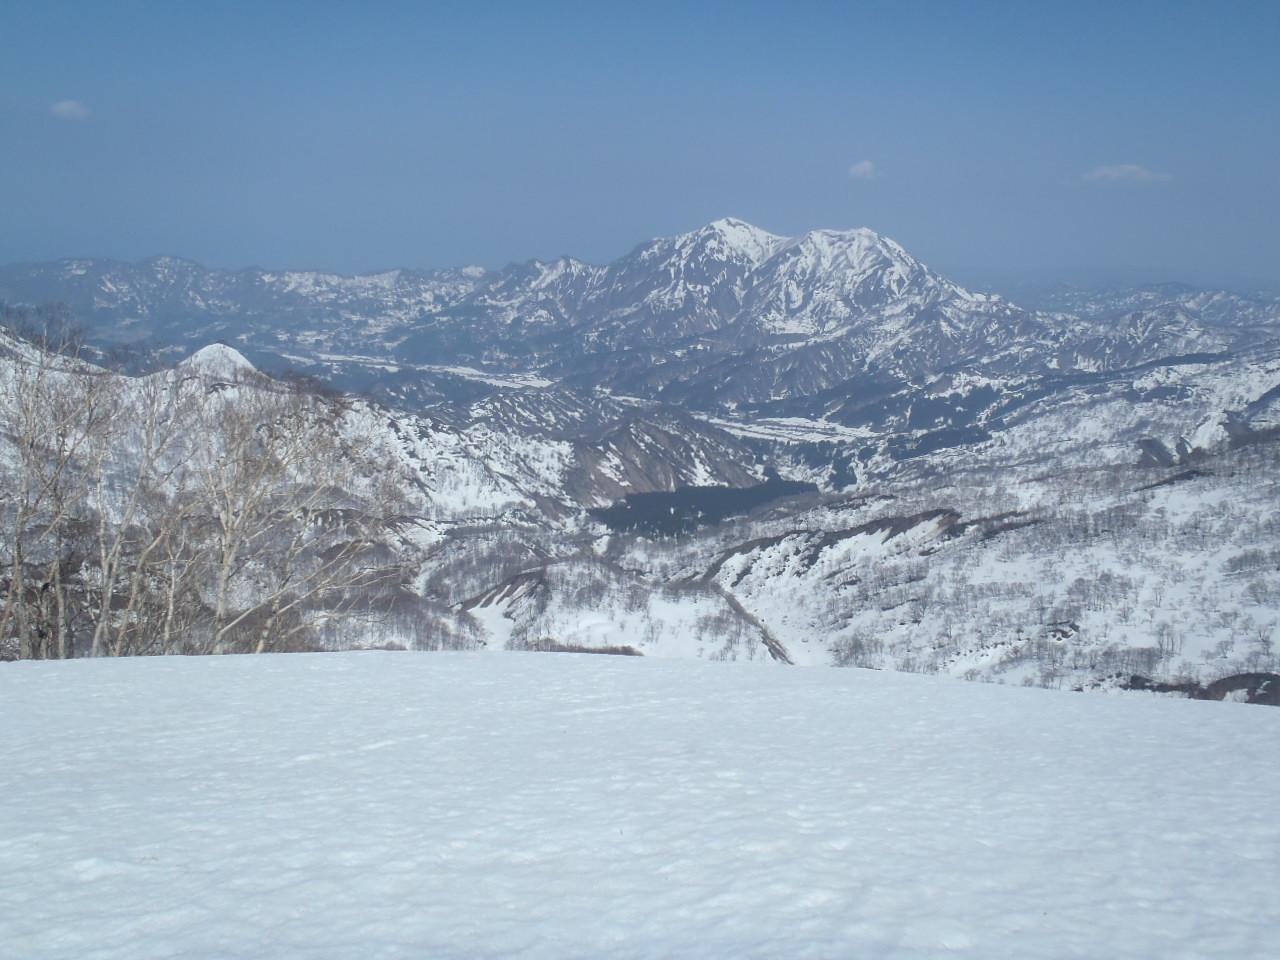 鉾ヶ岳,権現岳